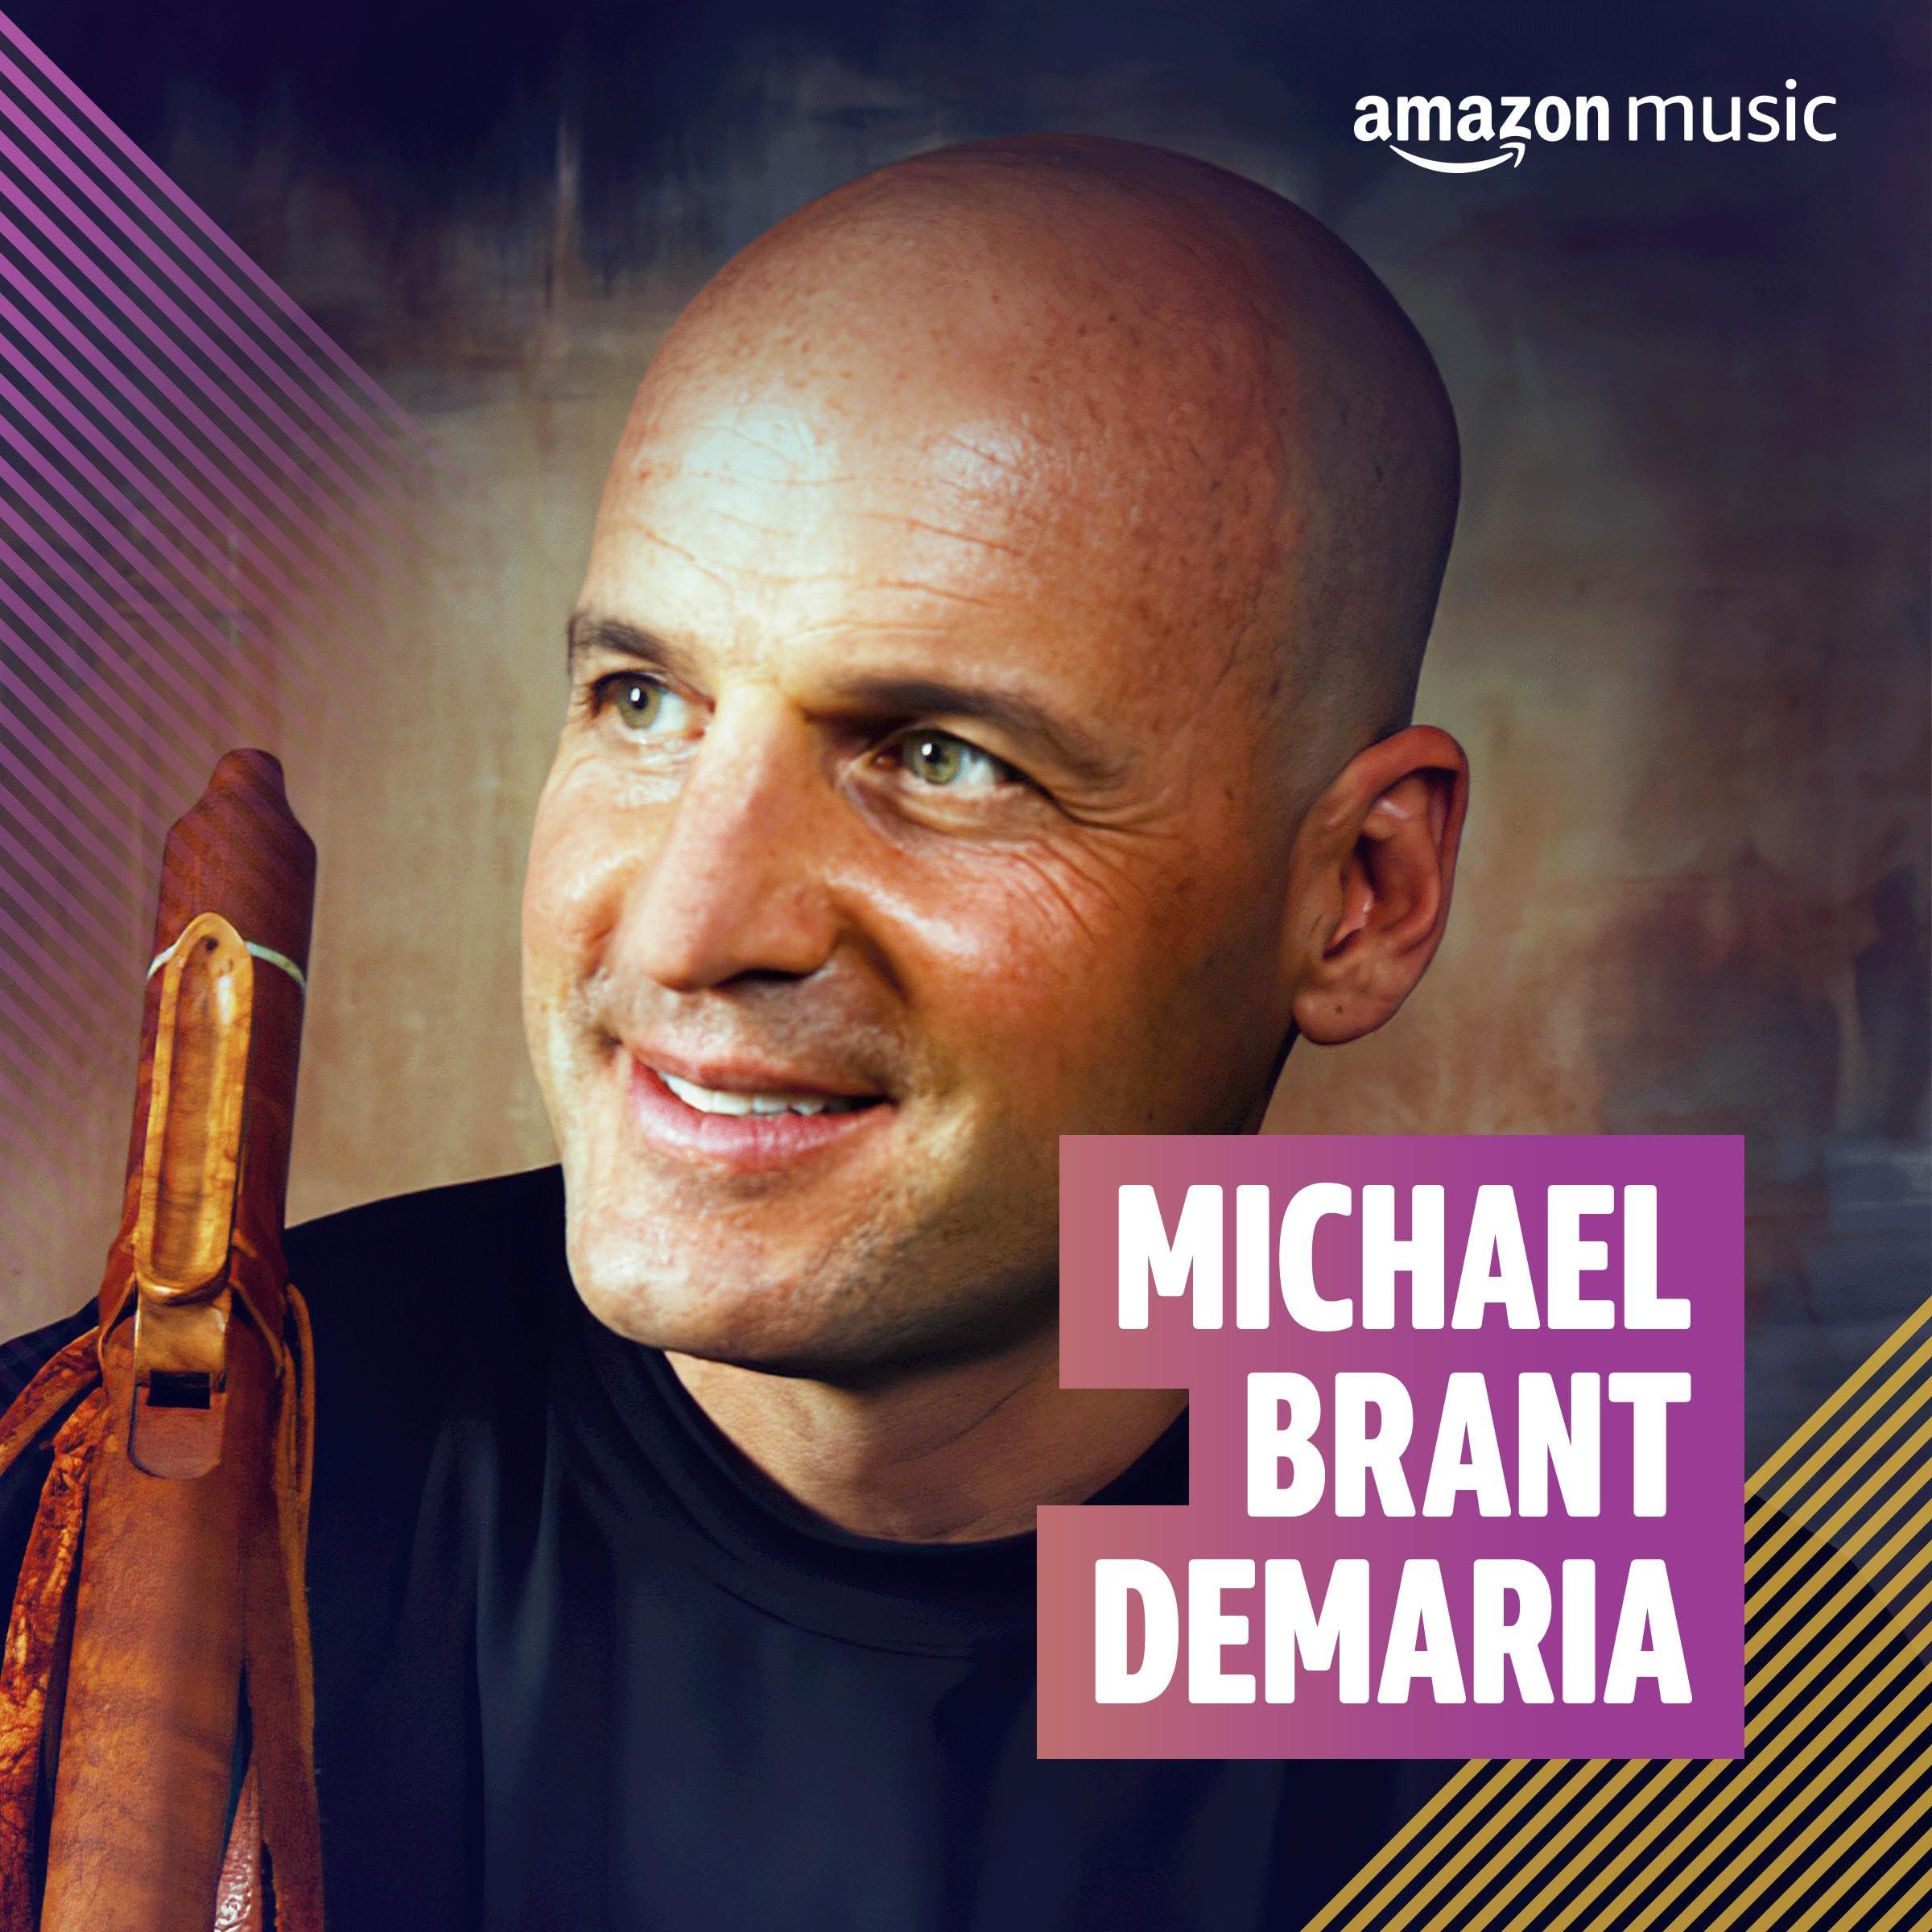 Michael Brant DeMaria